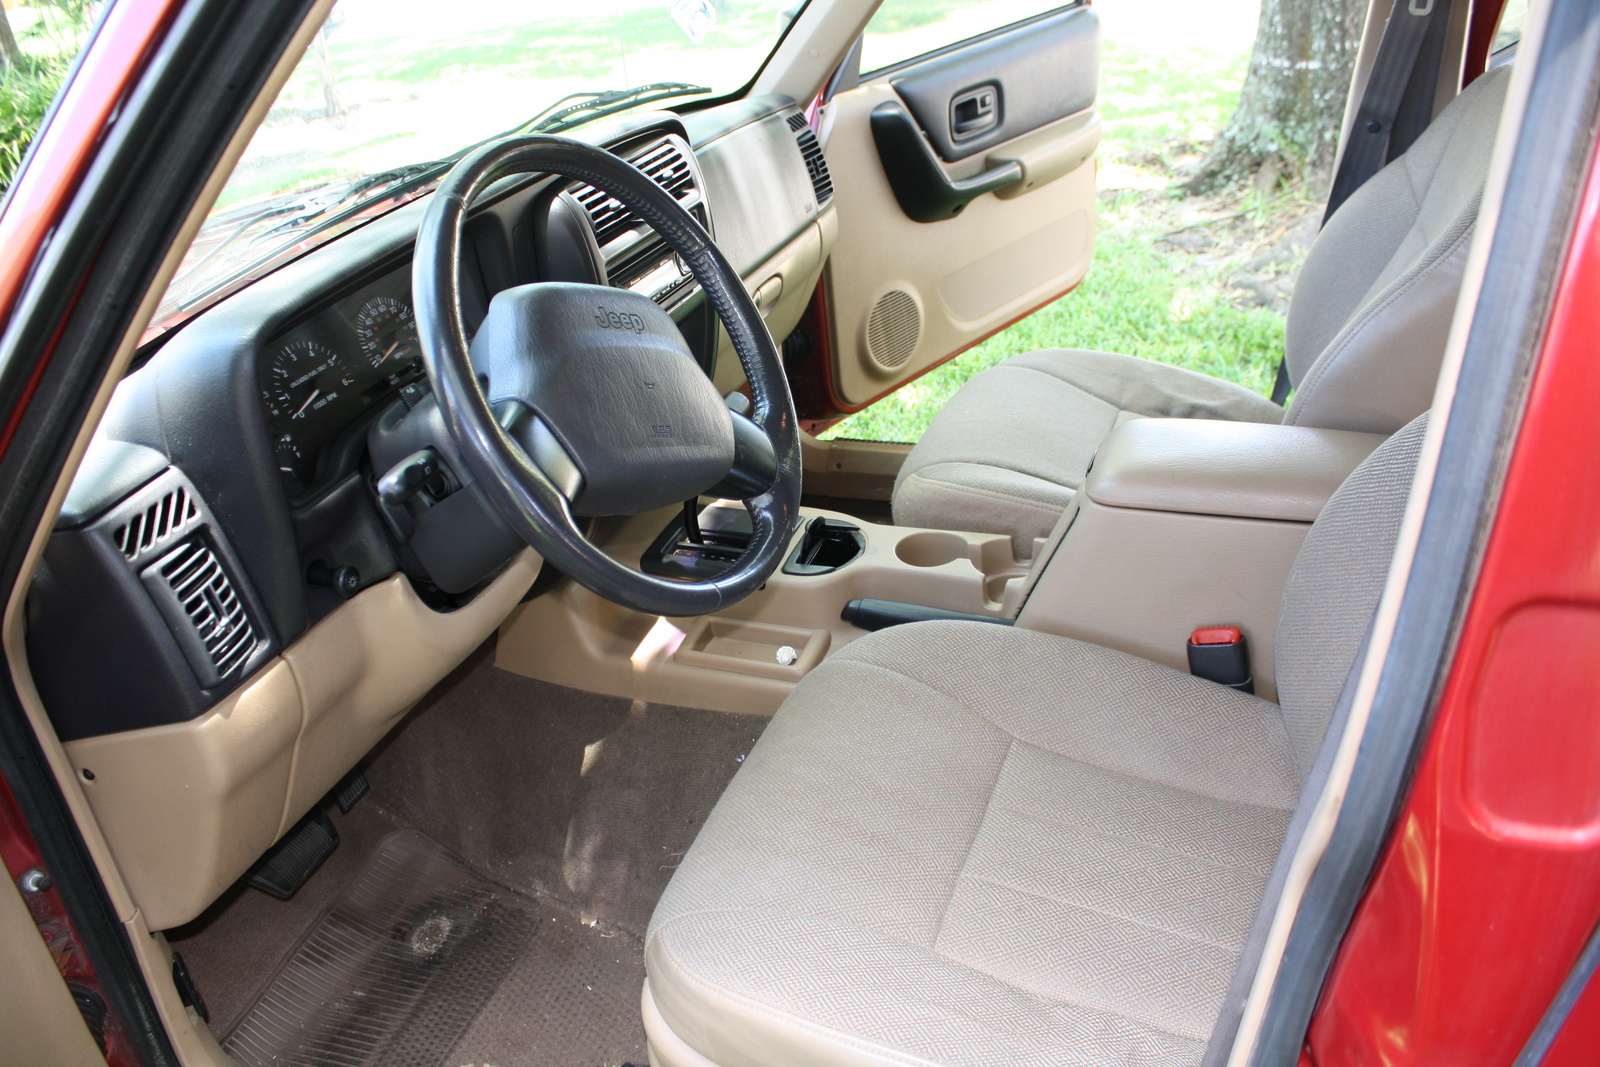 1999 Jeep Cherokee Interior Pictures Cargurus